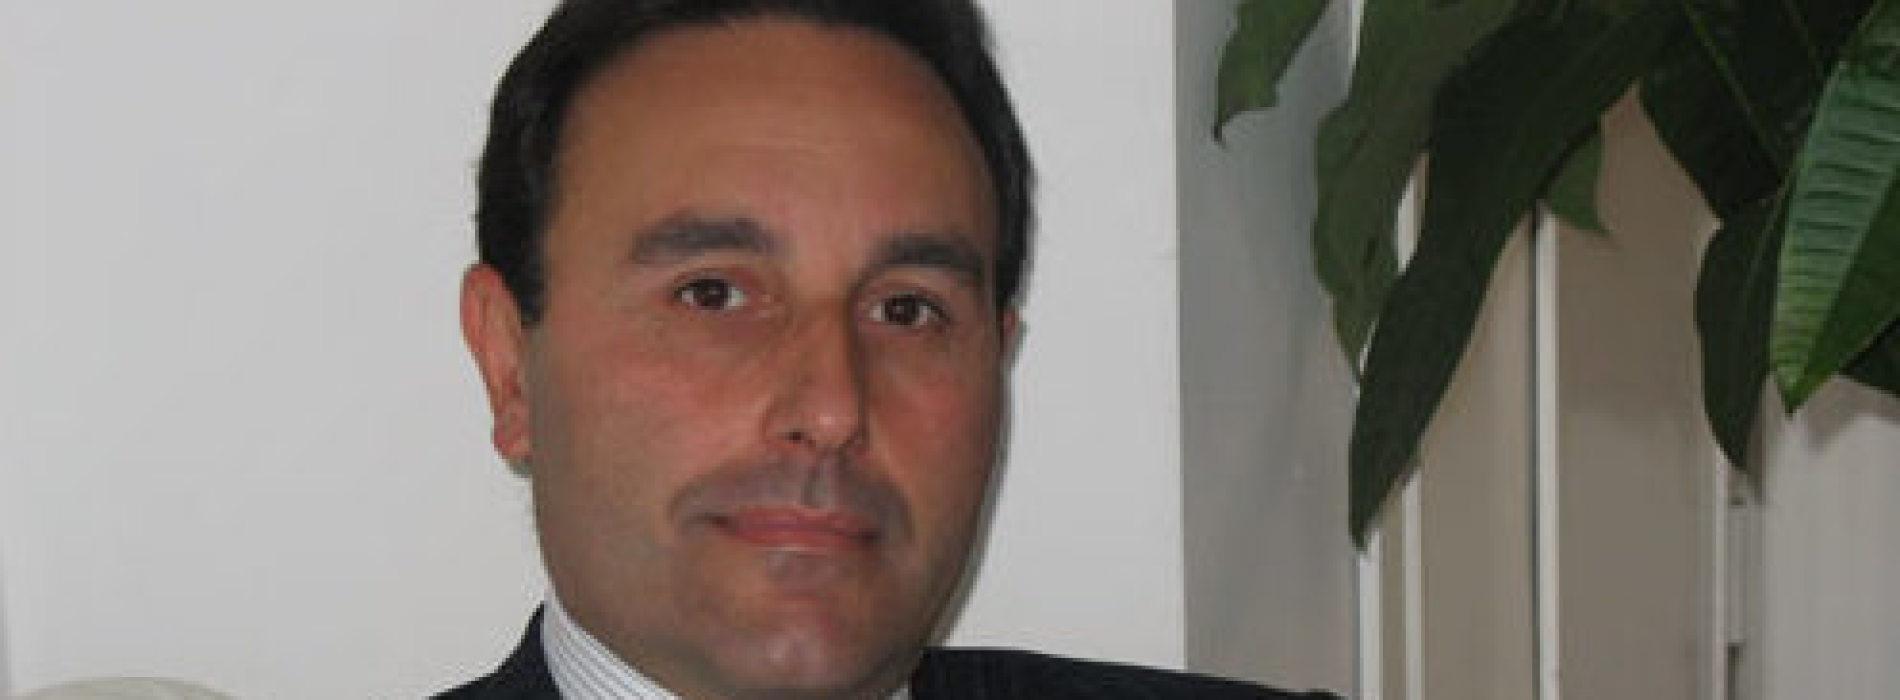 Budget sanitari esauriti a Caserta, interviene Salvatore (AISA)